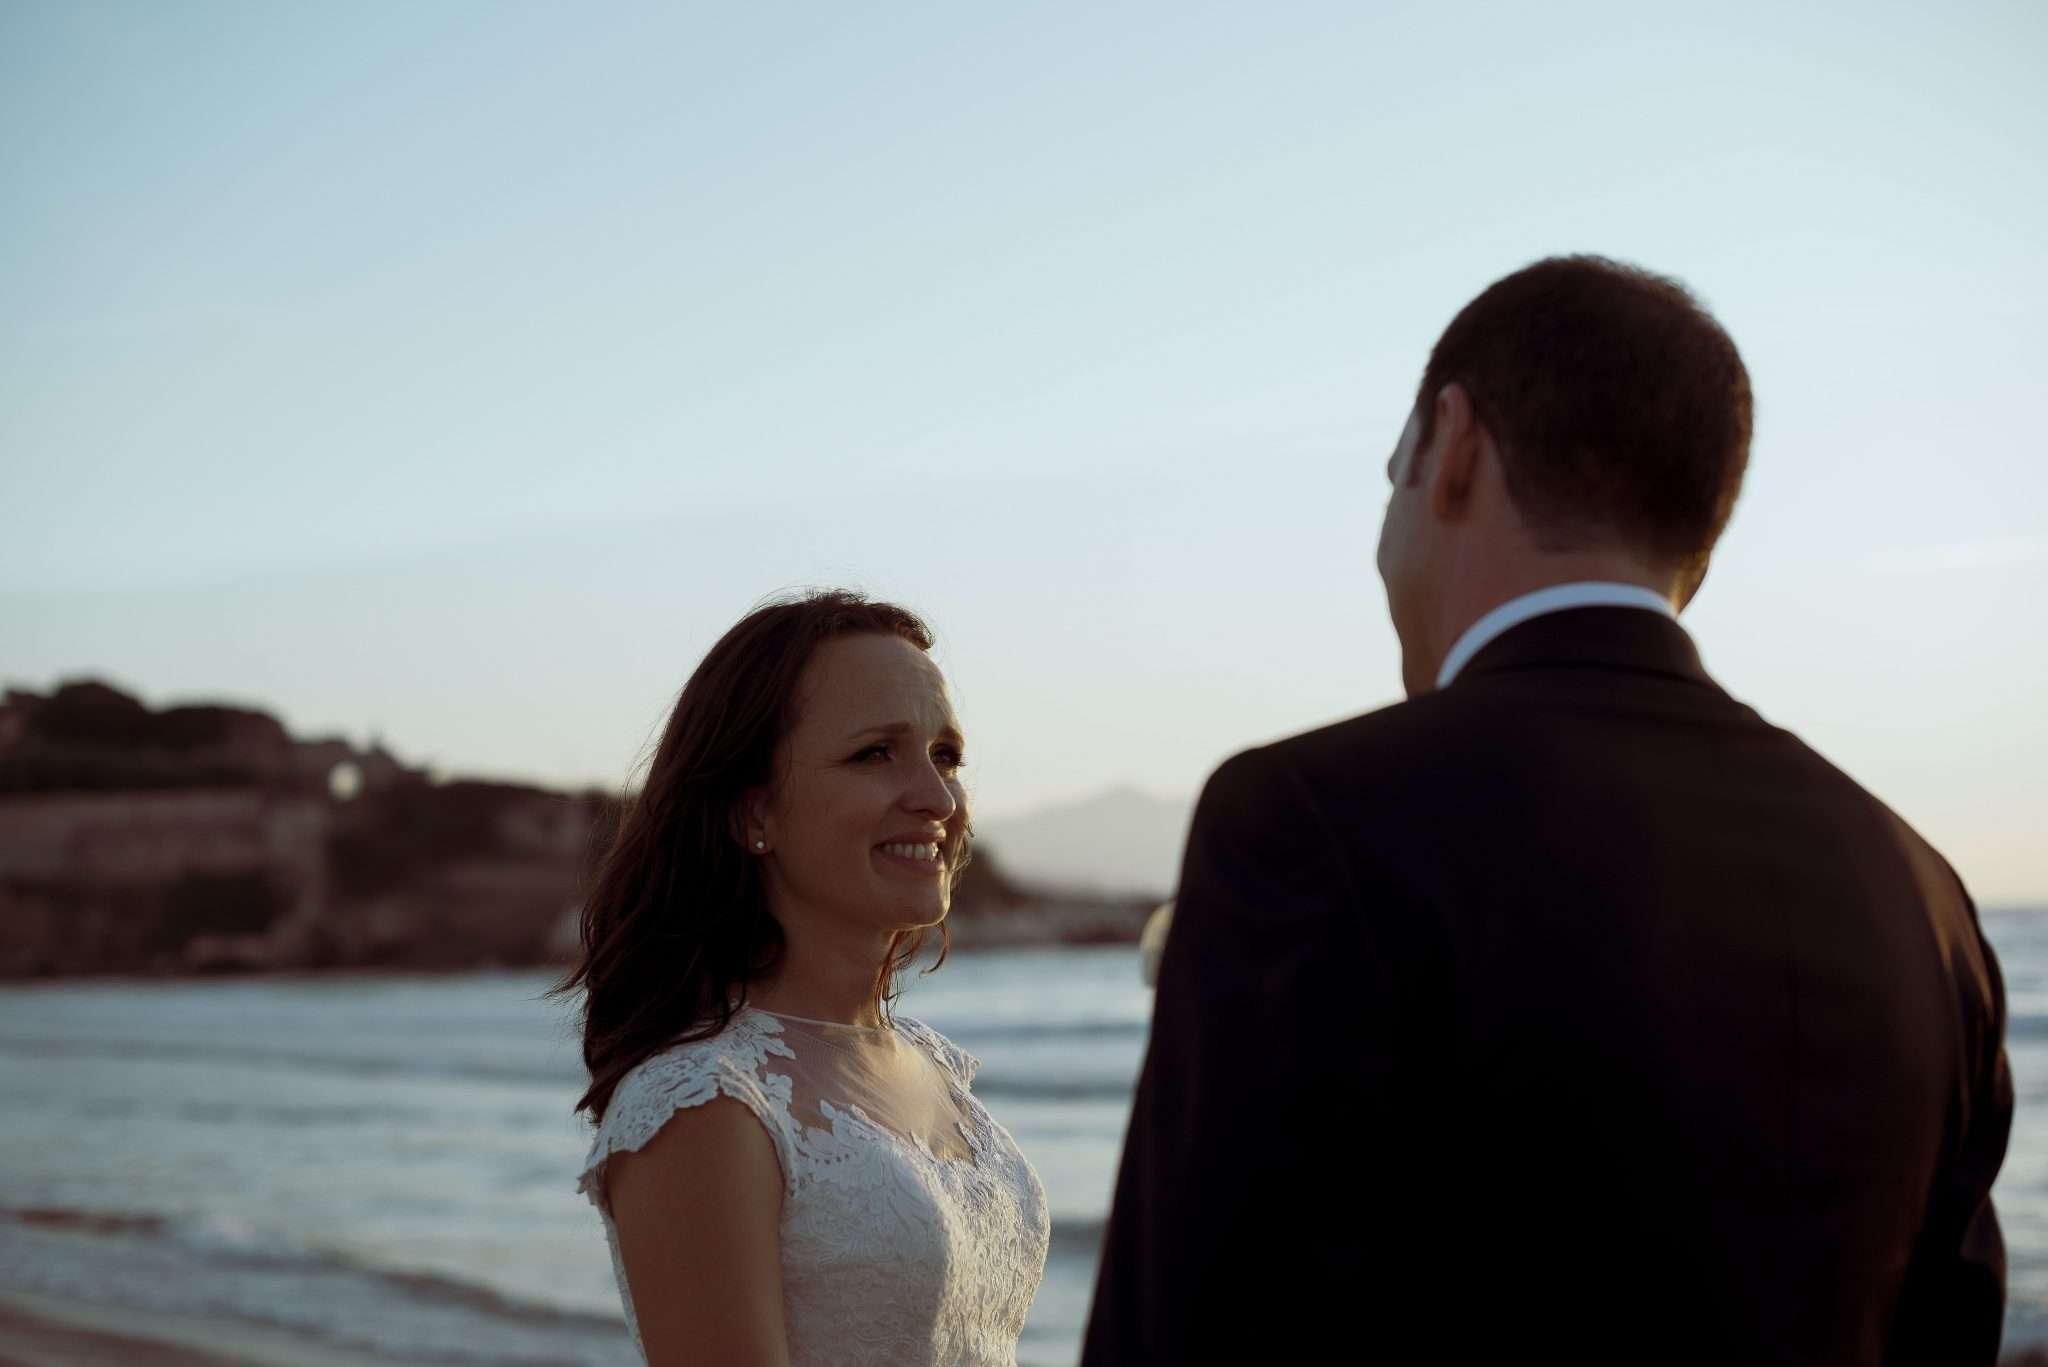 Sposa innamorata al tramonto